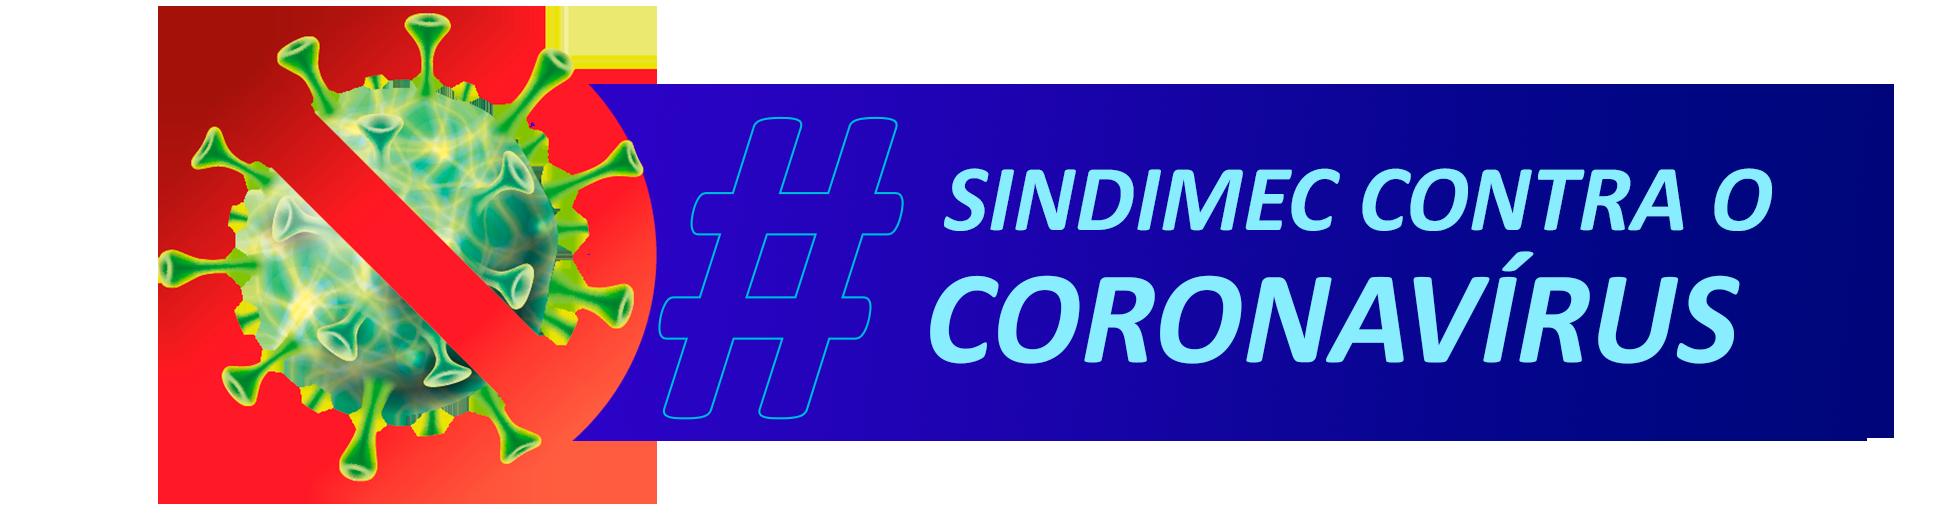 contra-o-coronavirus